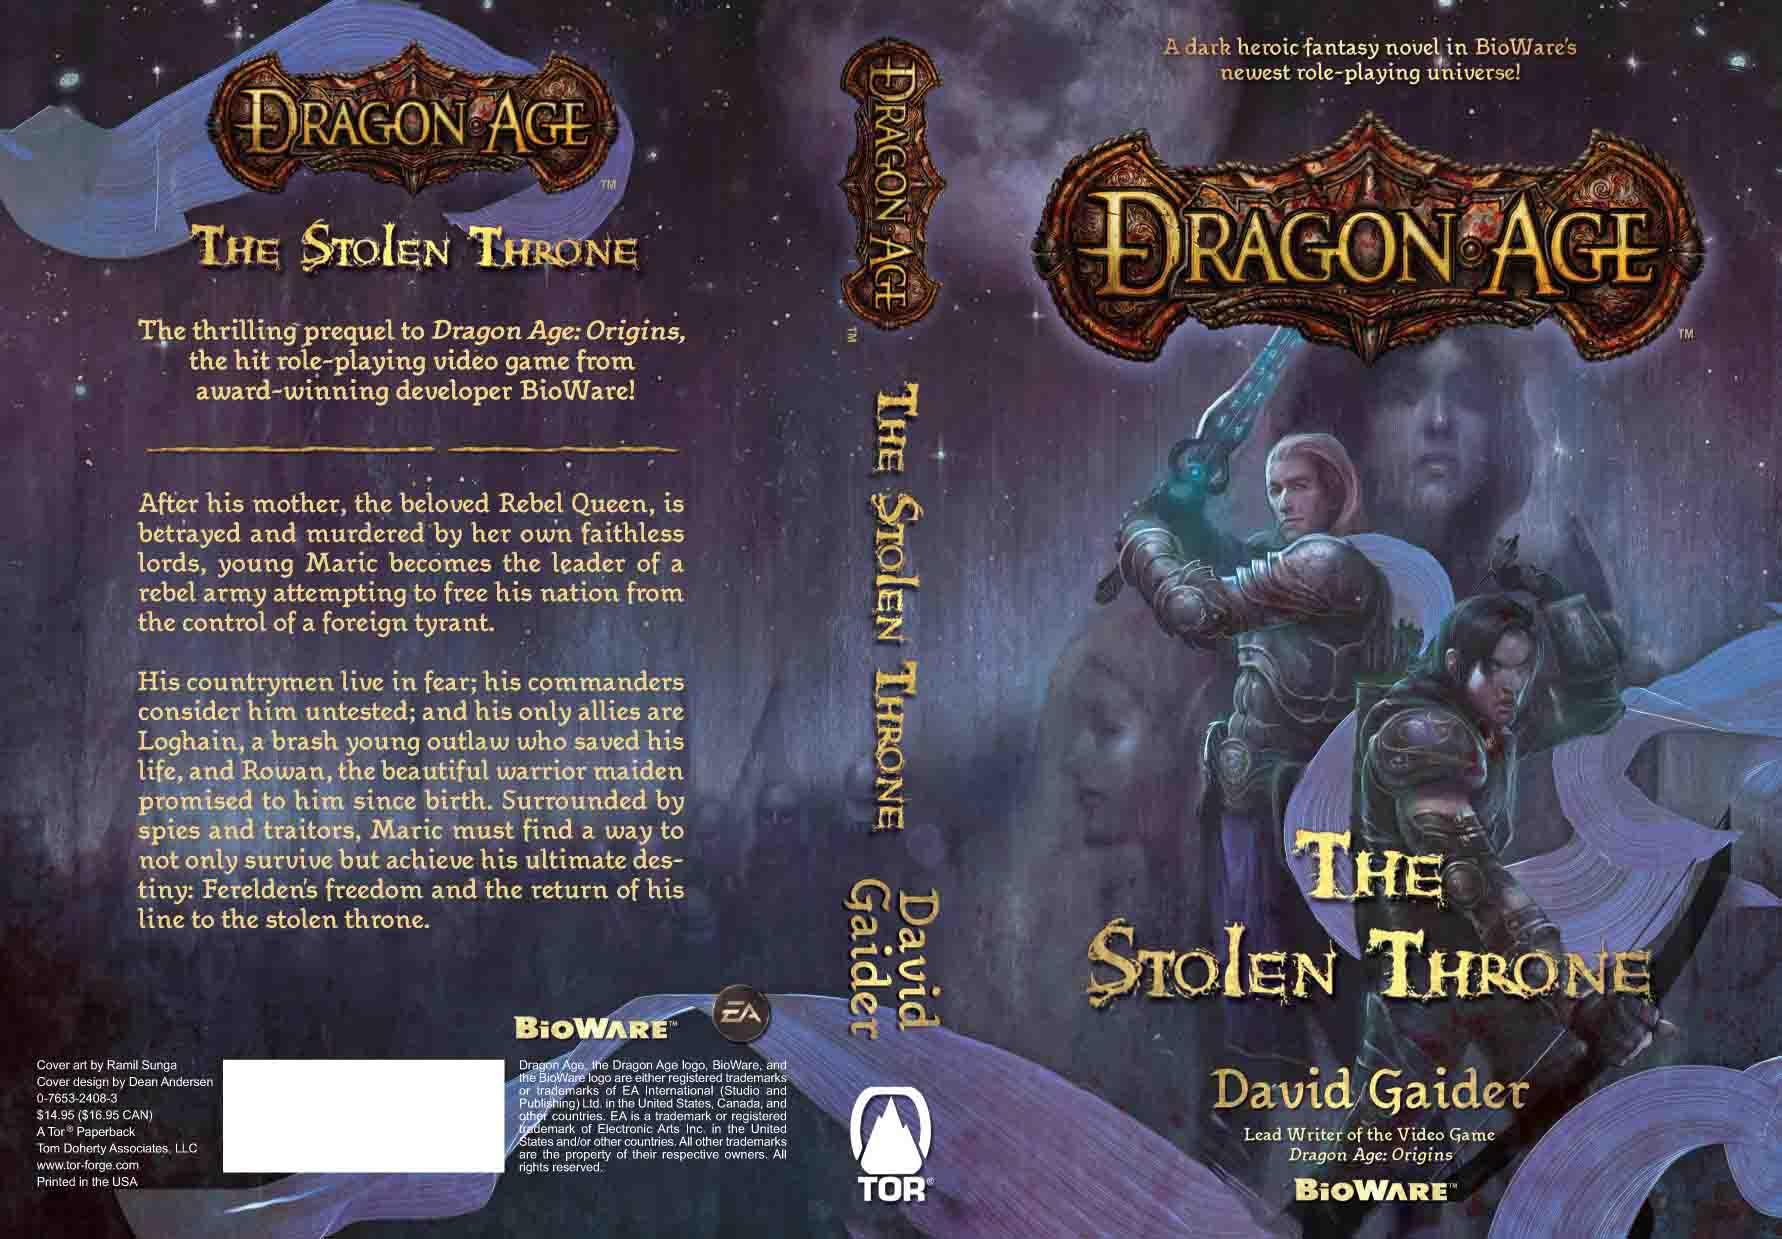 Tor Books To Publish Latest Bioware Novel Tor Books To Publish Latest Bioware Novel 3175SquallSnake7